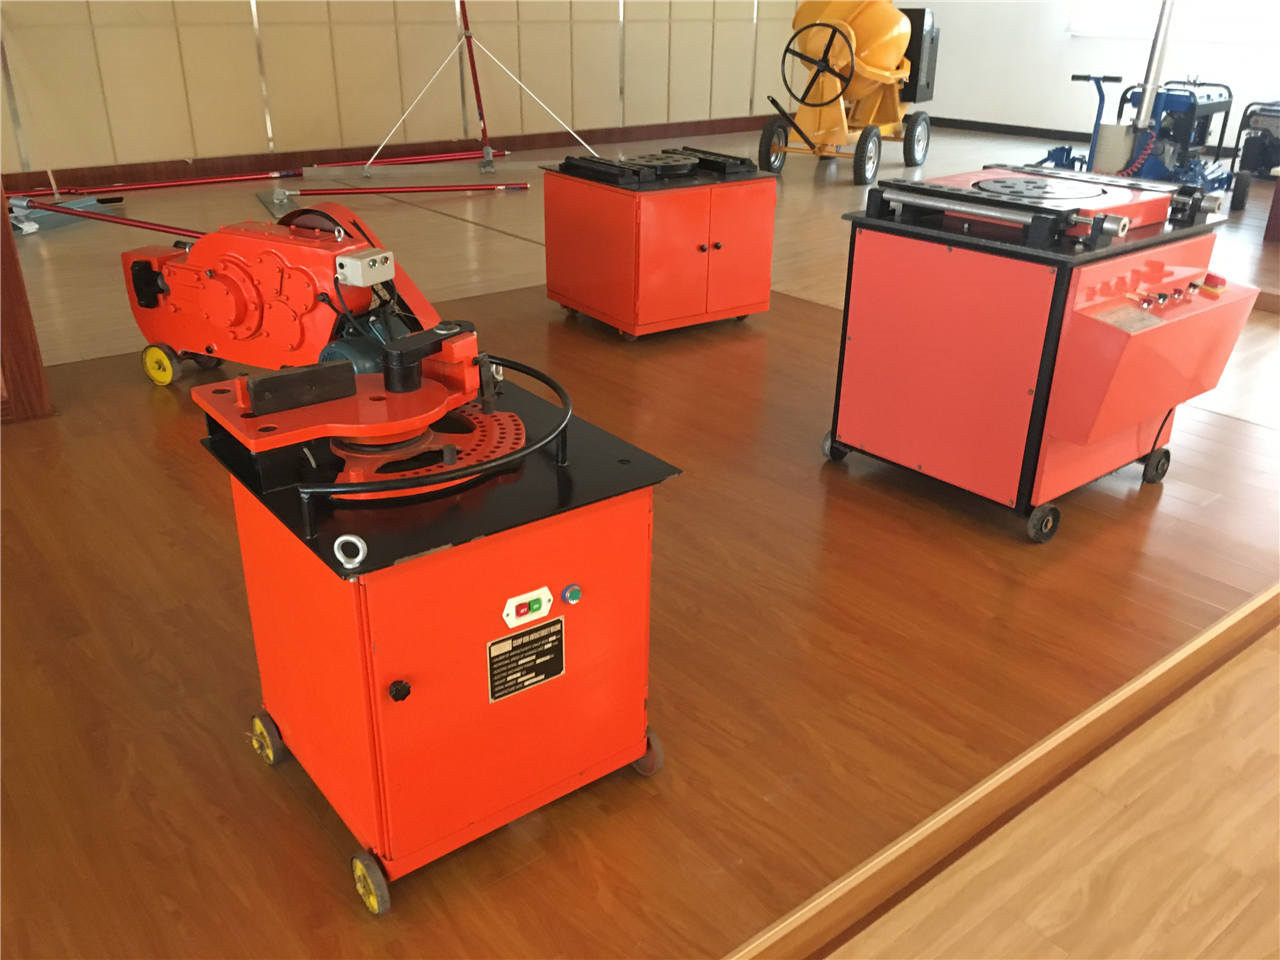 Bar Shear Machine, Rebar Cutting Machine, Round Steel Bar Cutter